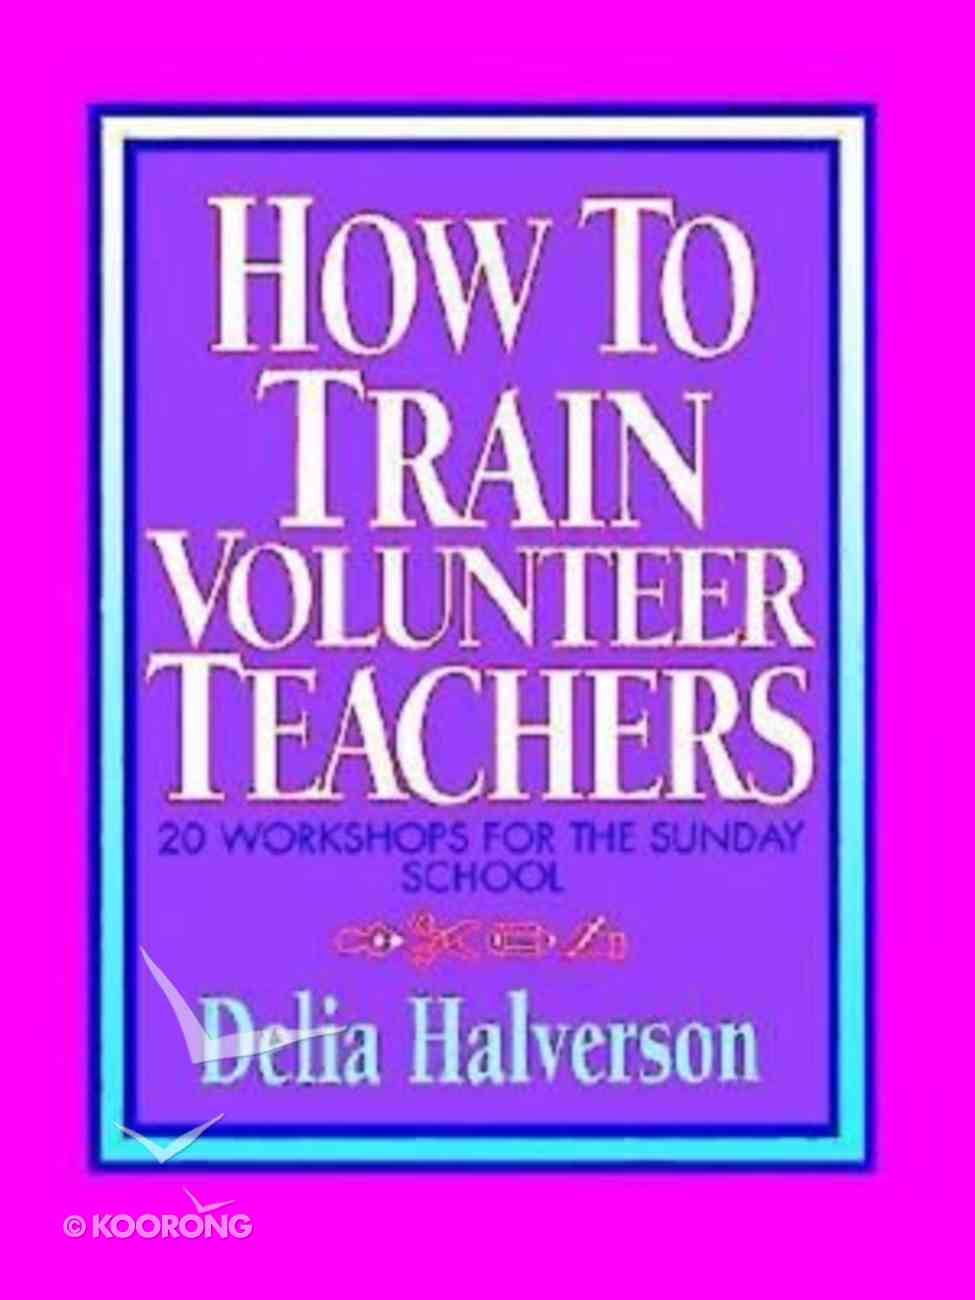 How to Train Volunteer Teachers Paperback